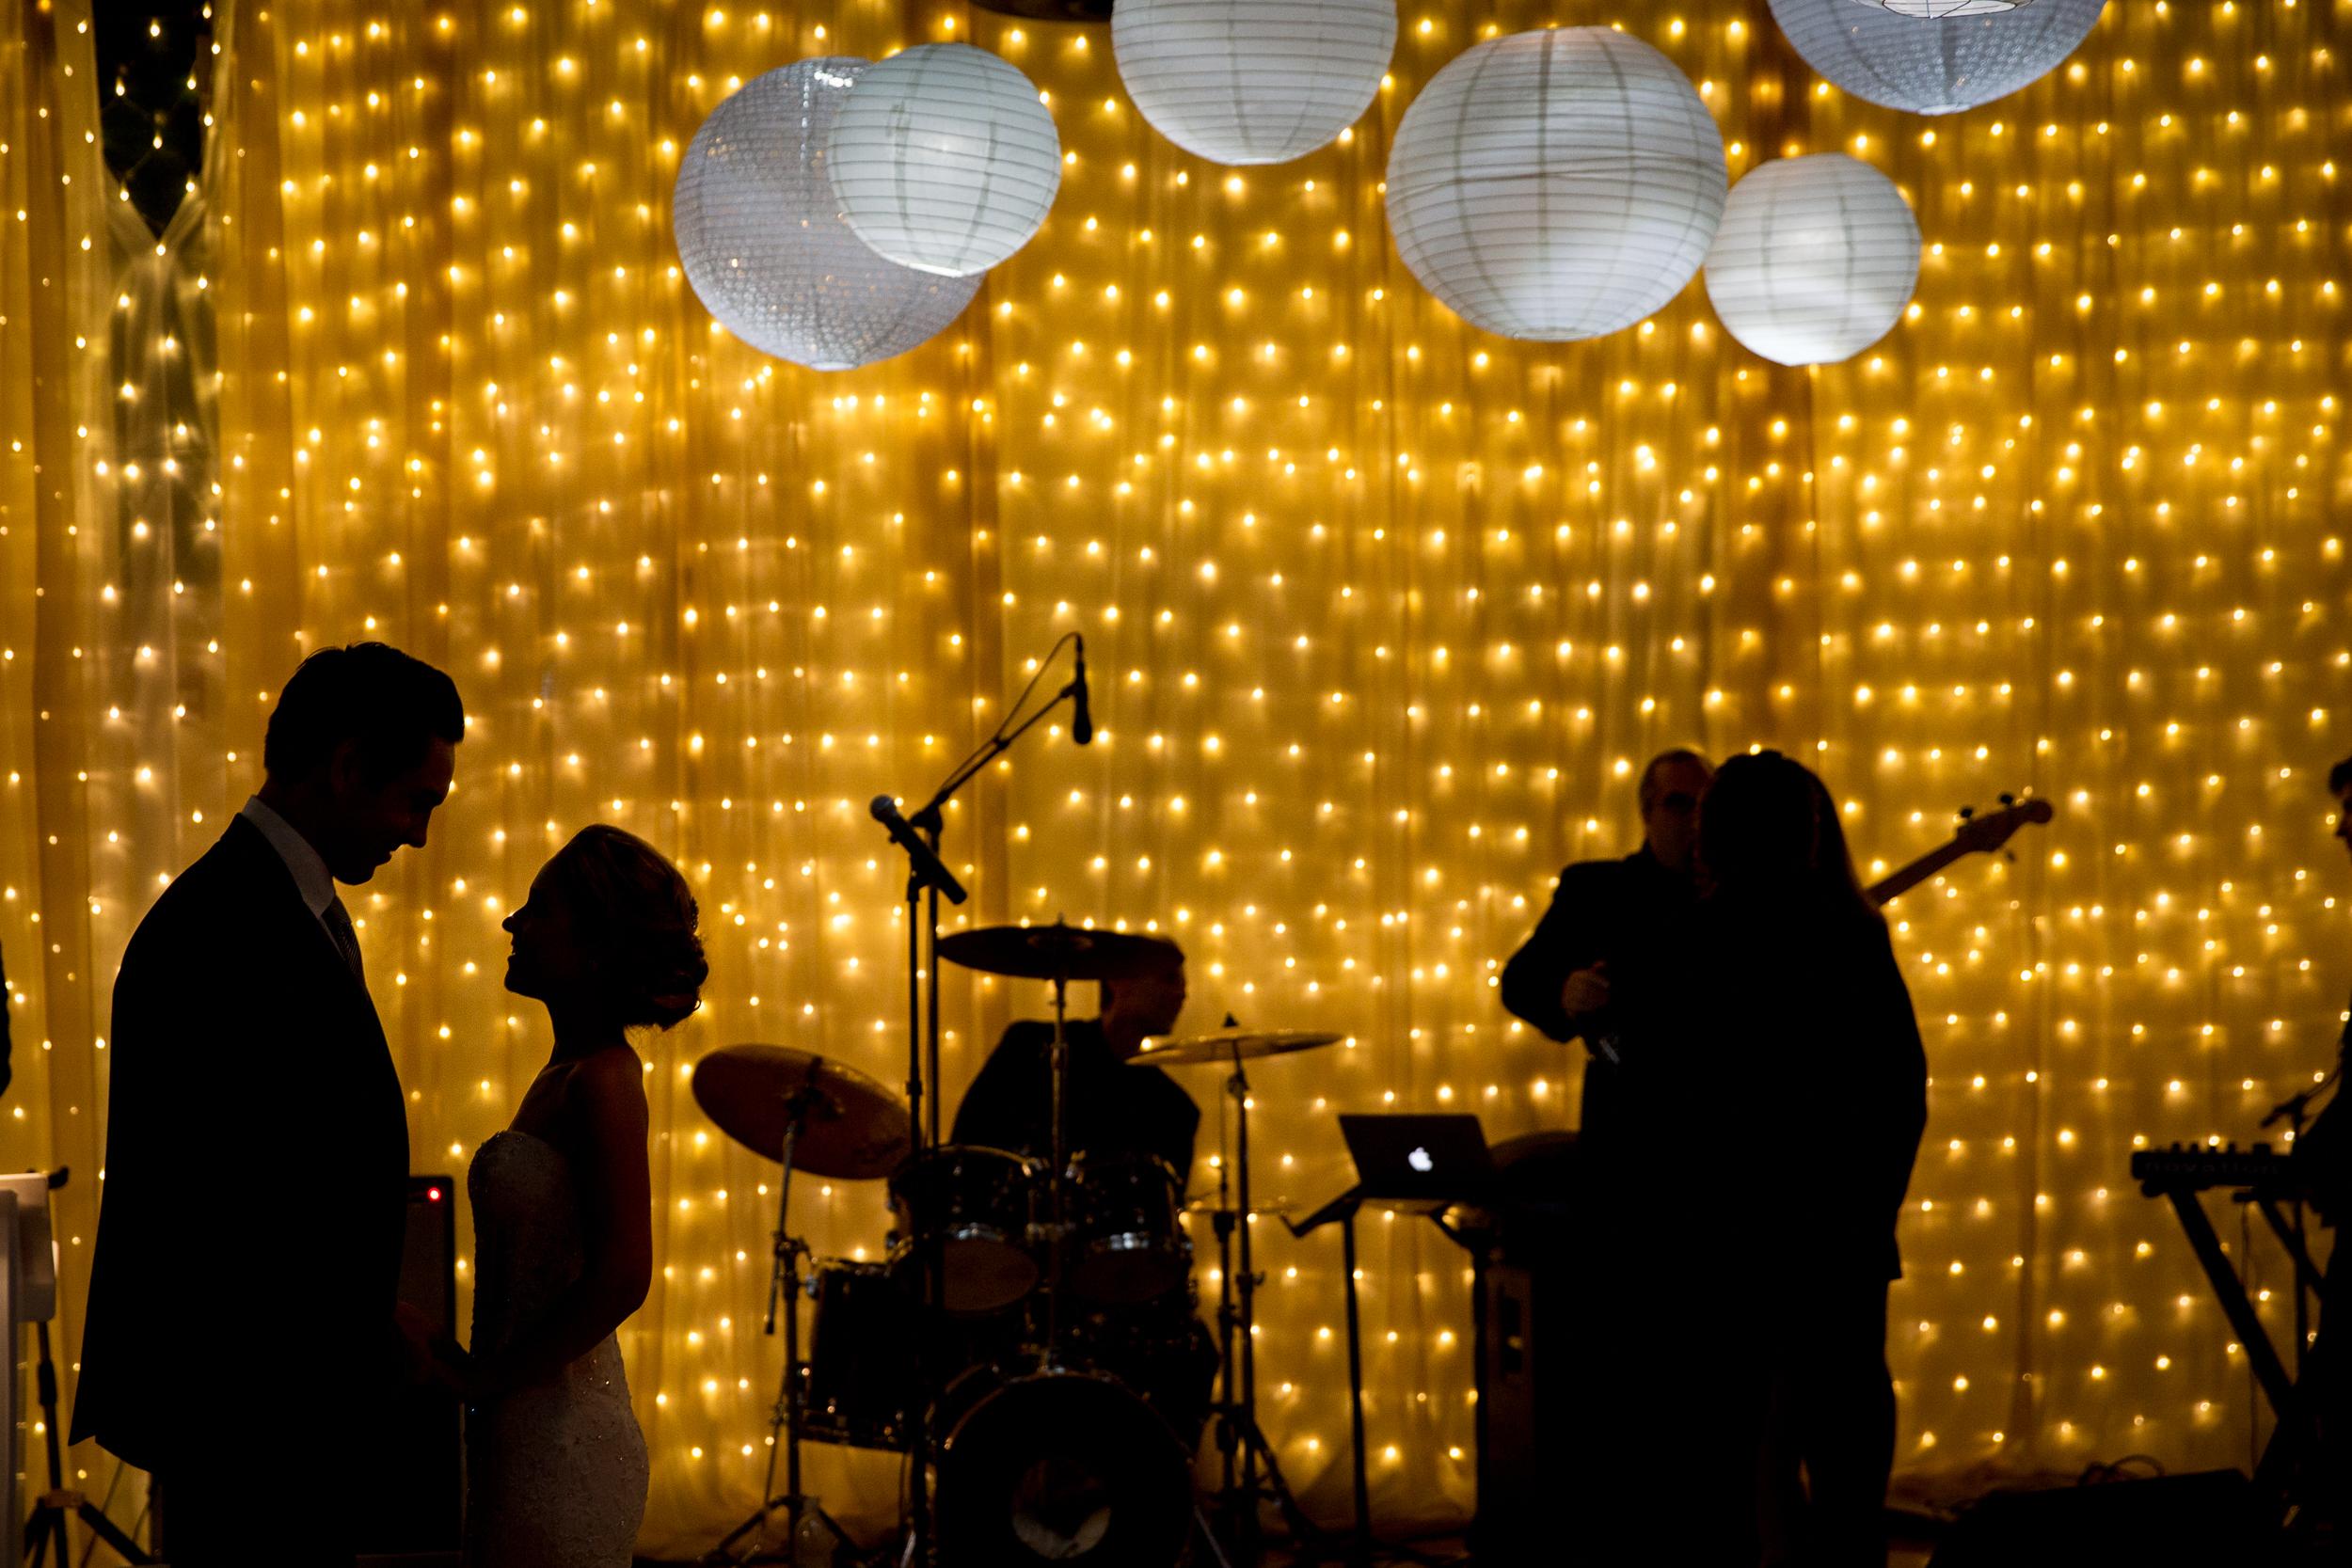 Ceci_New_York_Style_Luxury_Custom_Summer_Wedding_CeciBride_Letterpress_NewYork_Foil_Lighthouse_Chelsea_Piers_70.jpg